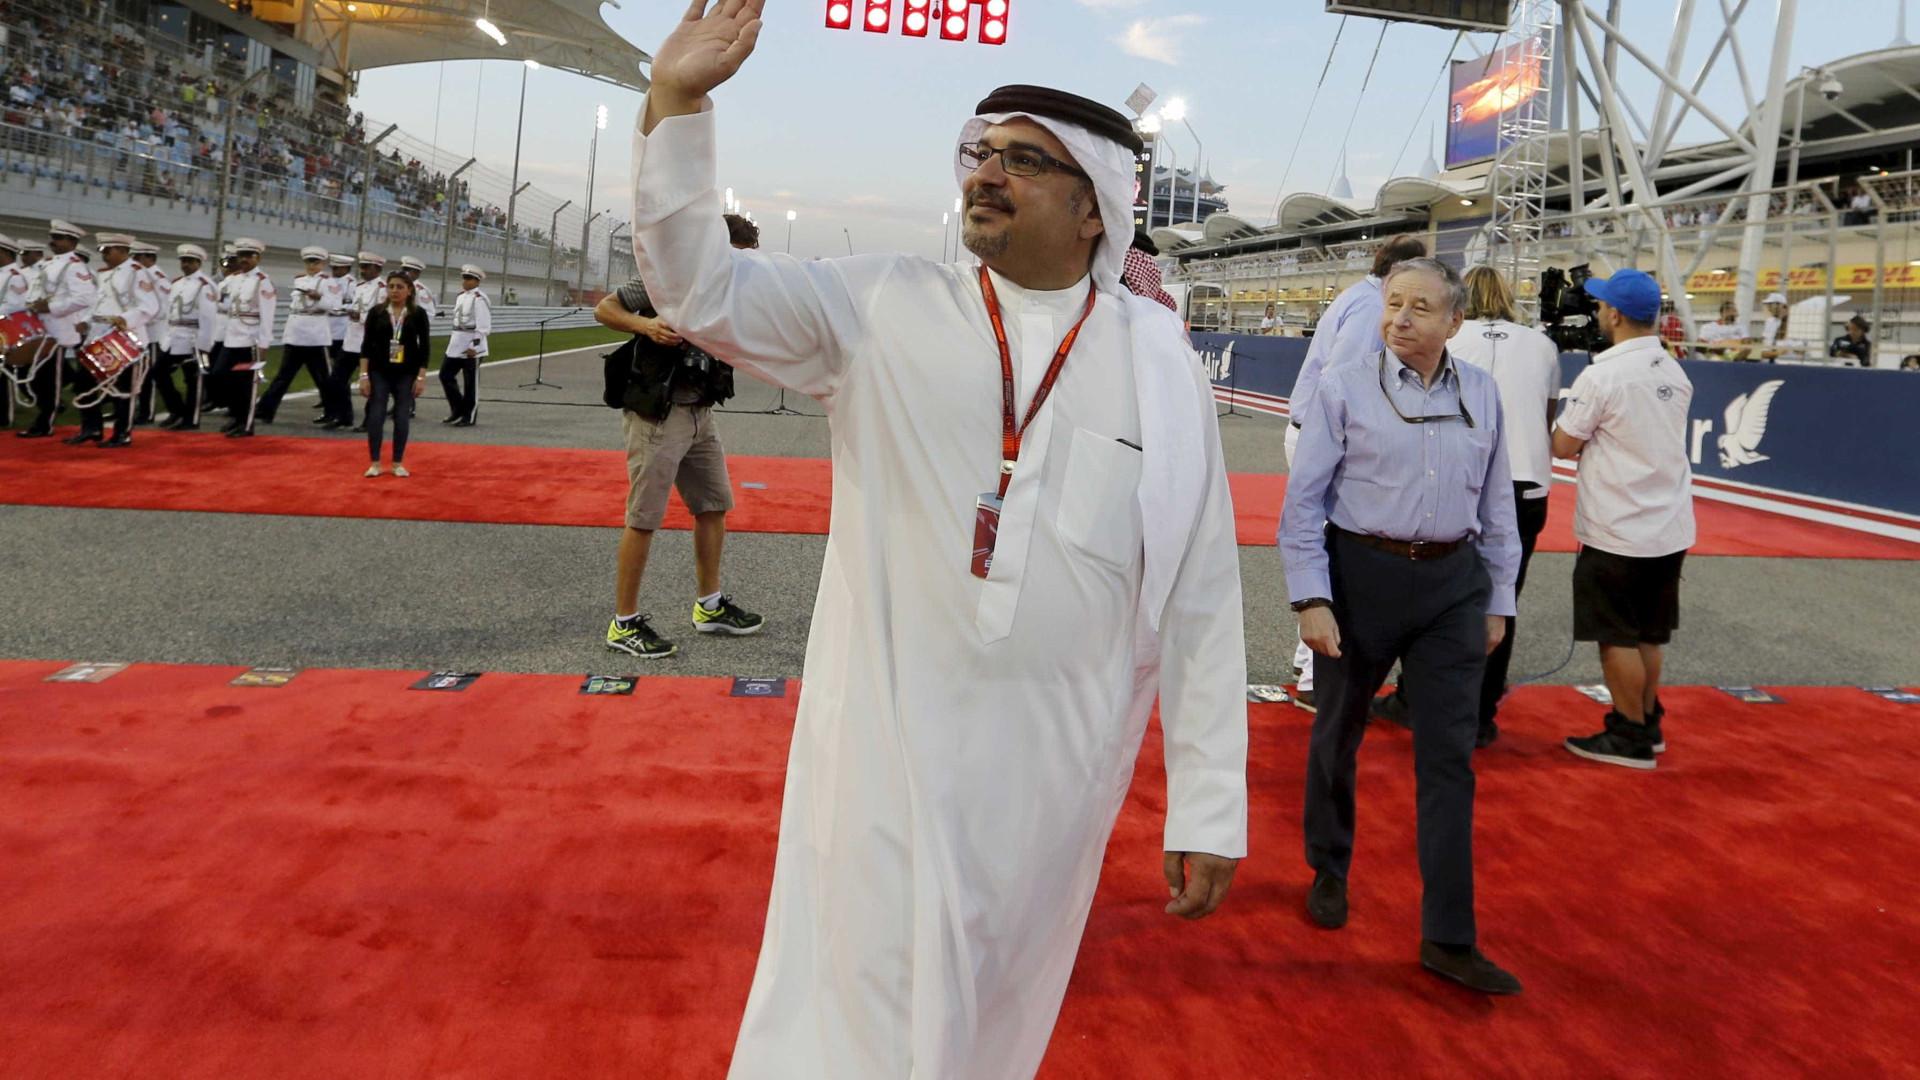 Vettel garante a largada no Grande Prêmio do Bahrain